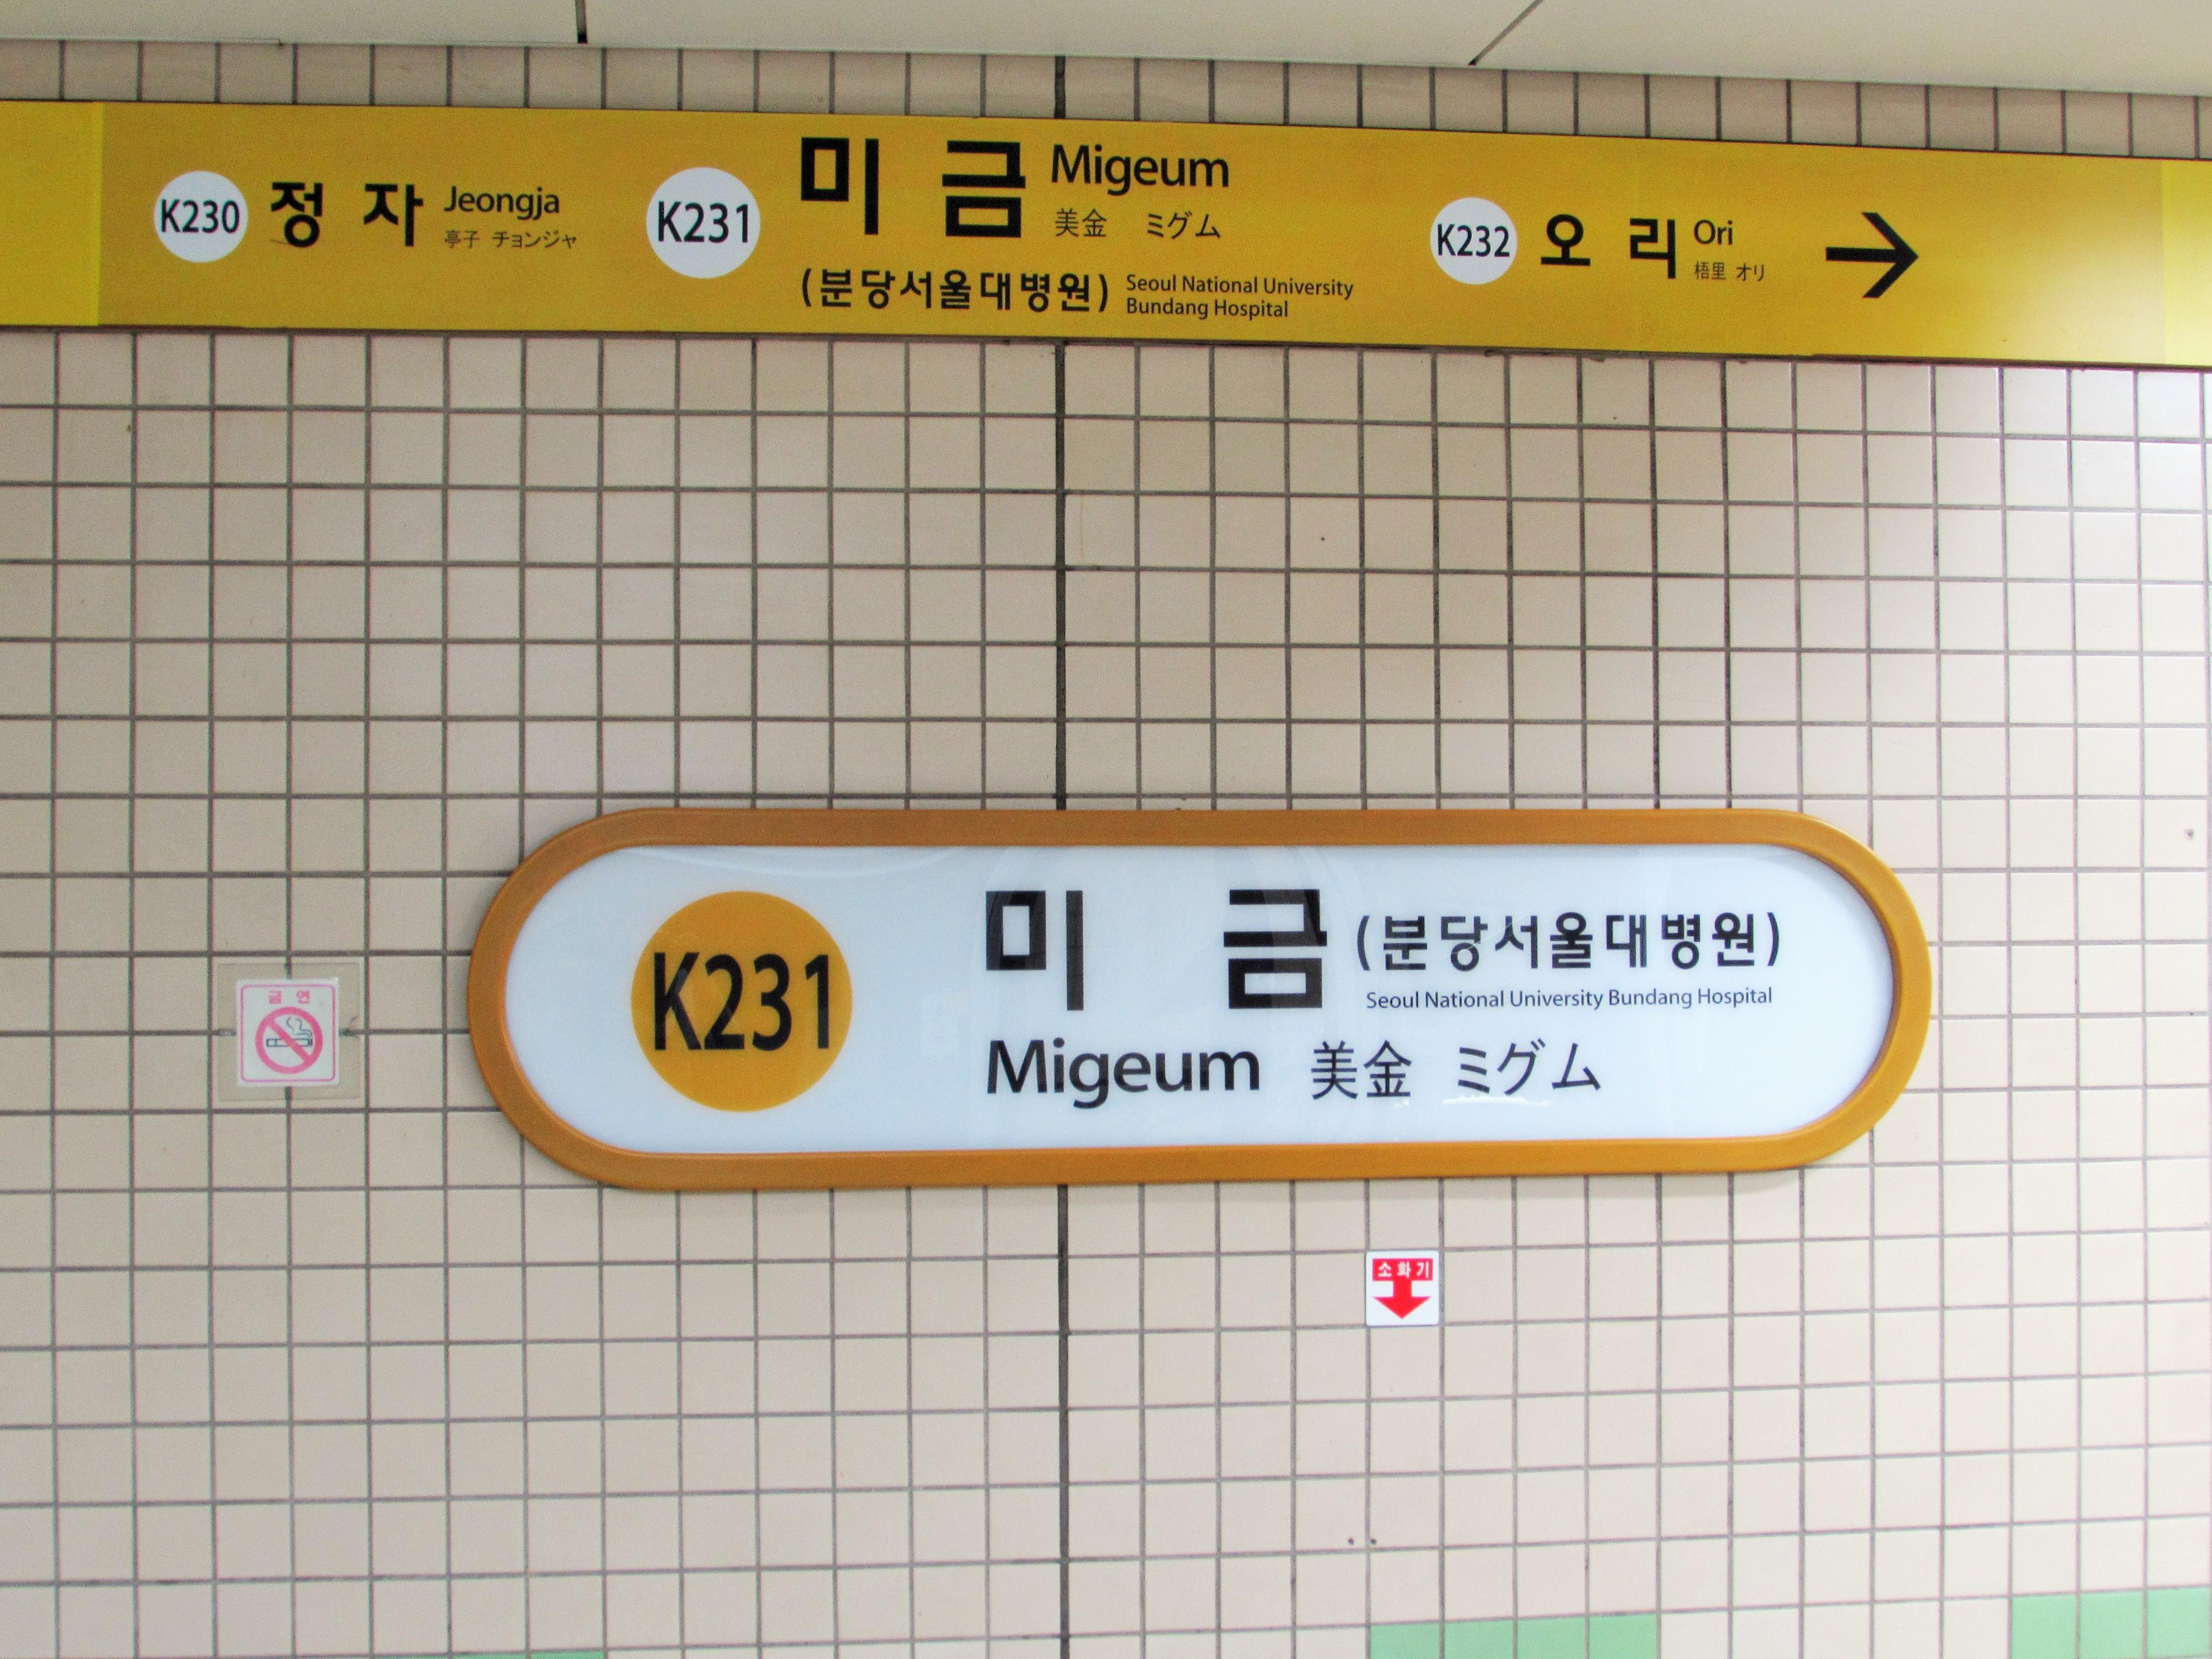 Jeongja Station Subway Map.Migeum Station Wikipedia